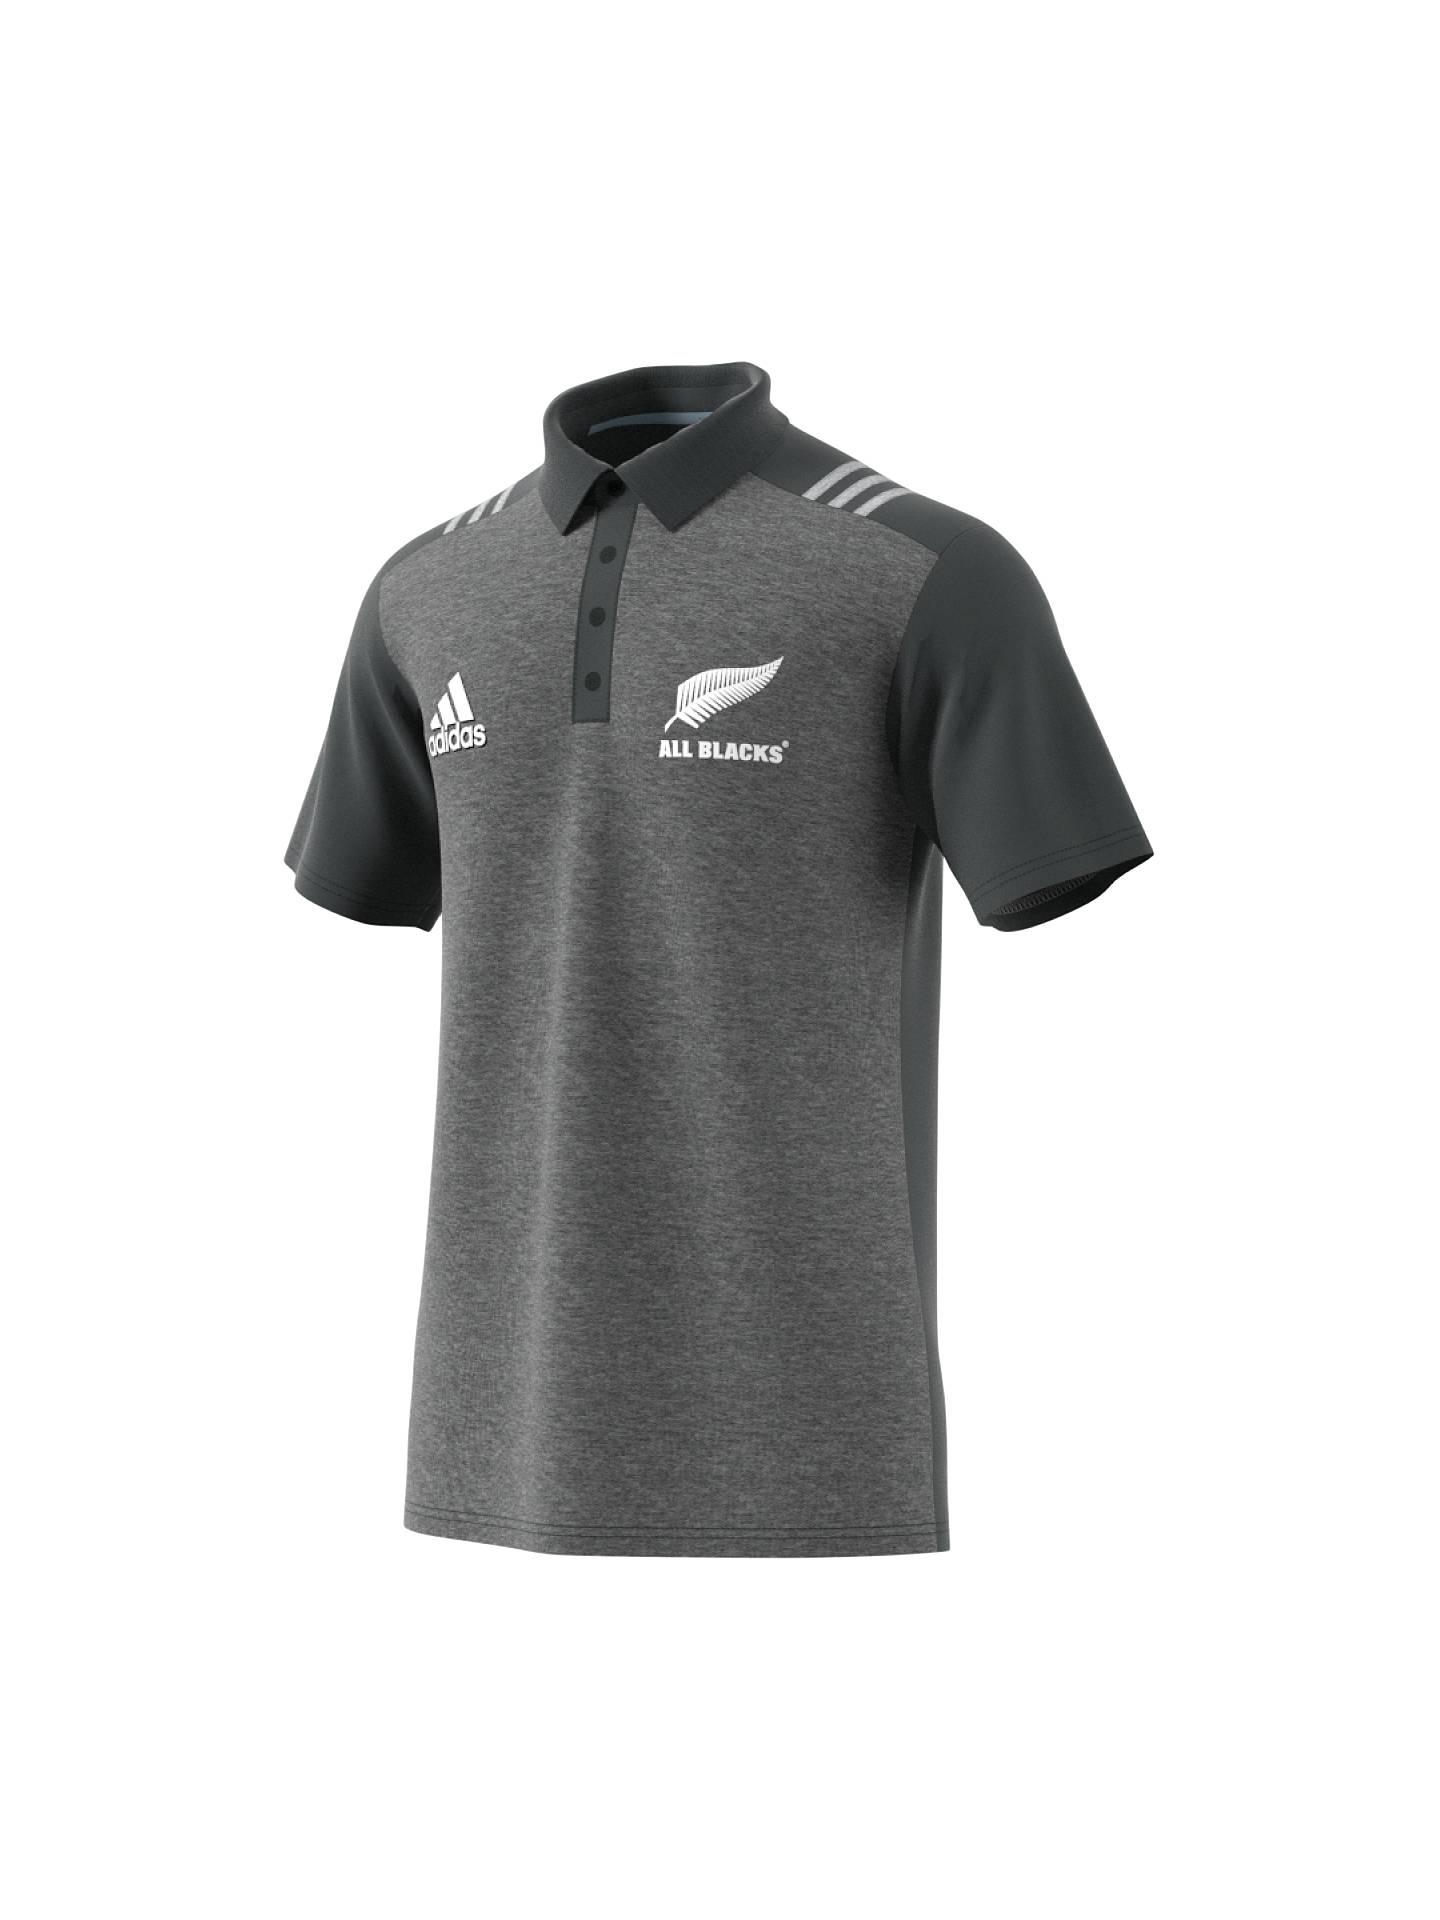 adidas Mens New Zealand All Blacks 2018 Rugby Polo Shirt T-Shirt Top Black